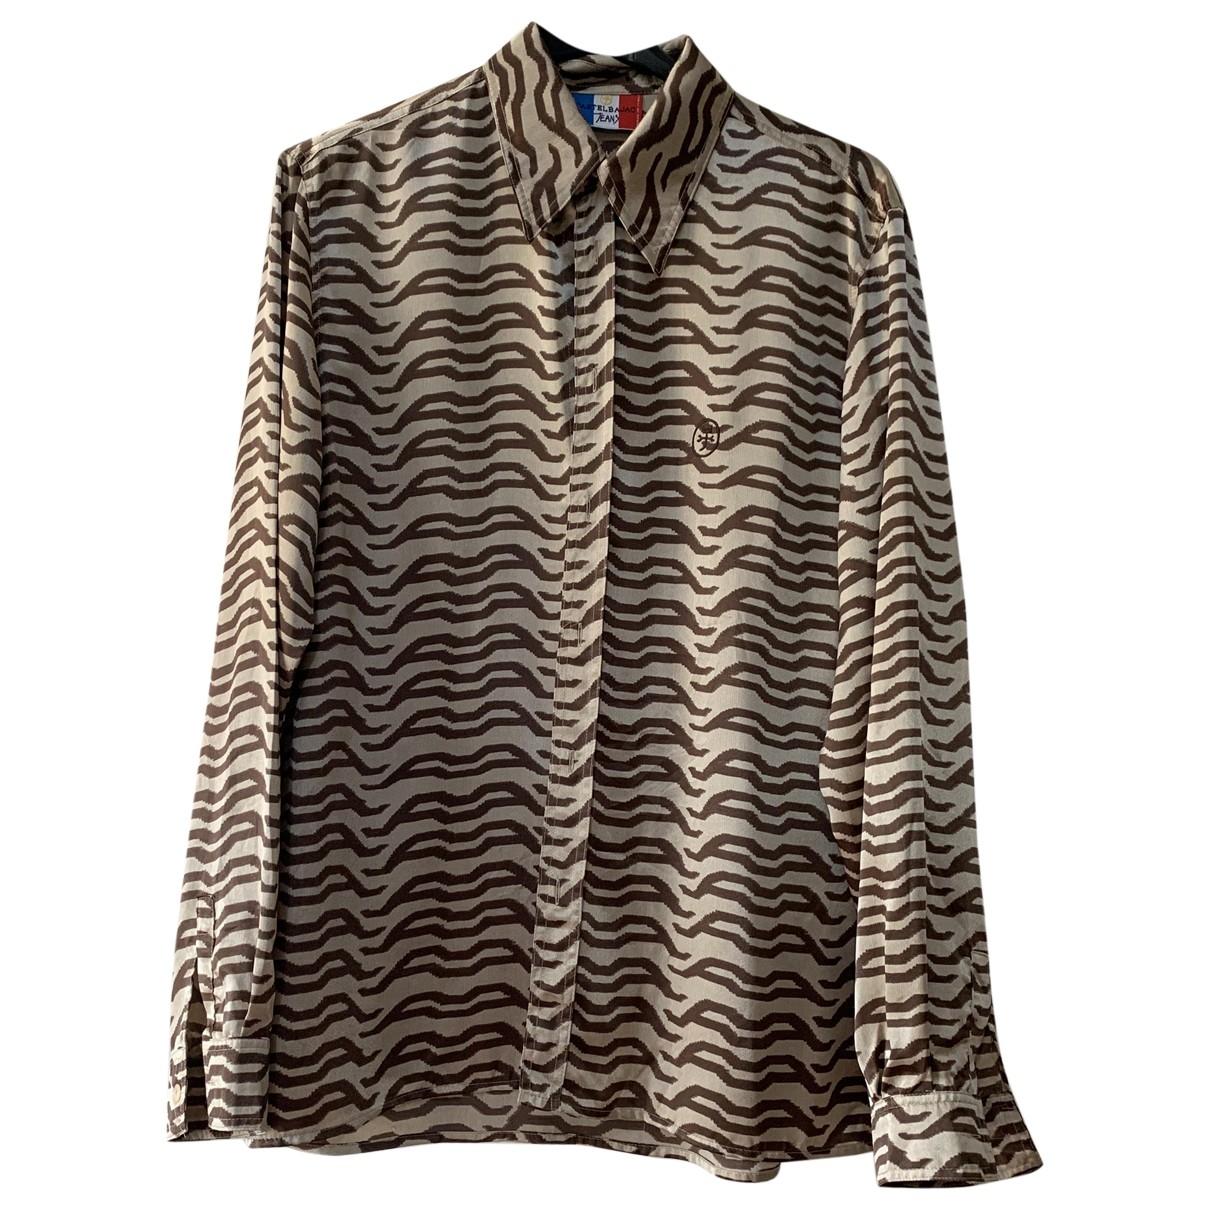 Jc De Castelbajac \N Hemden in  Braun Synthetik